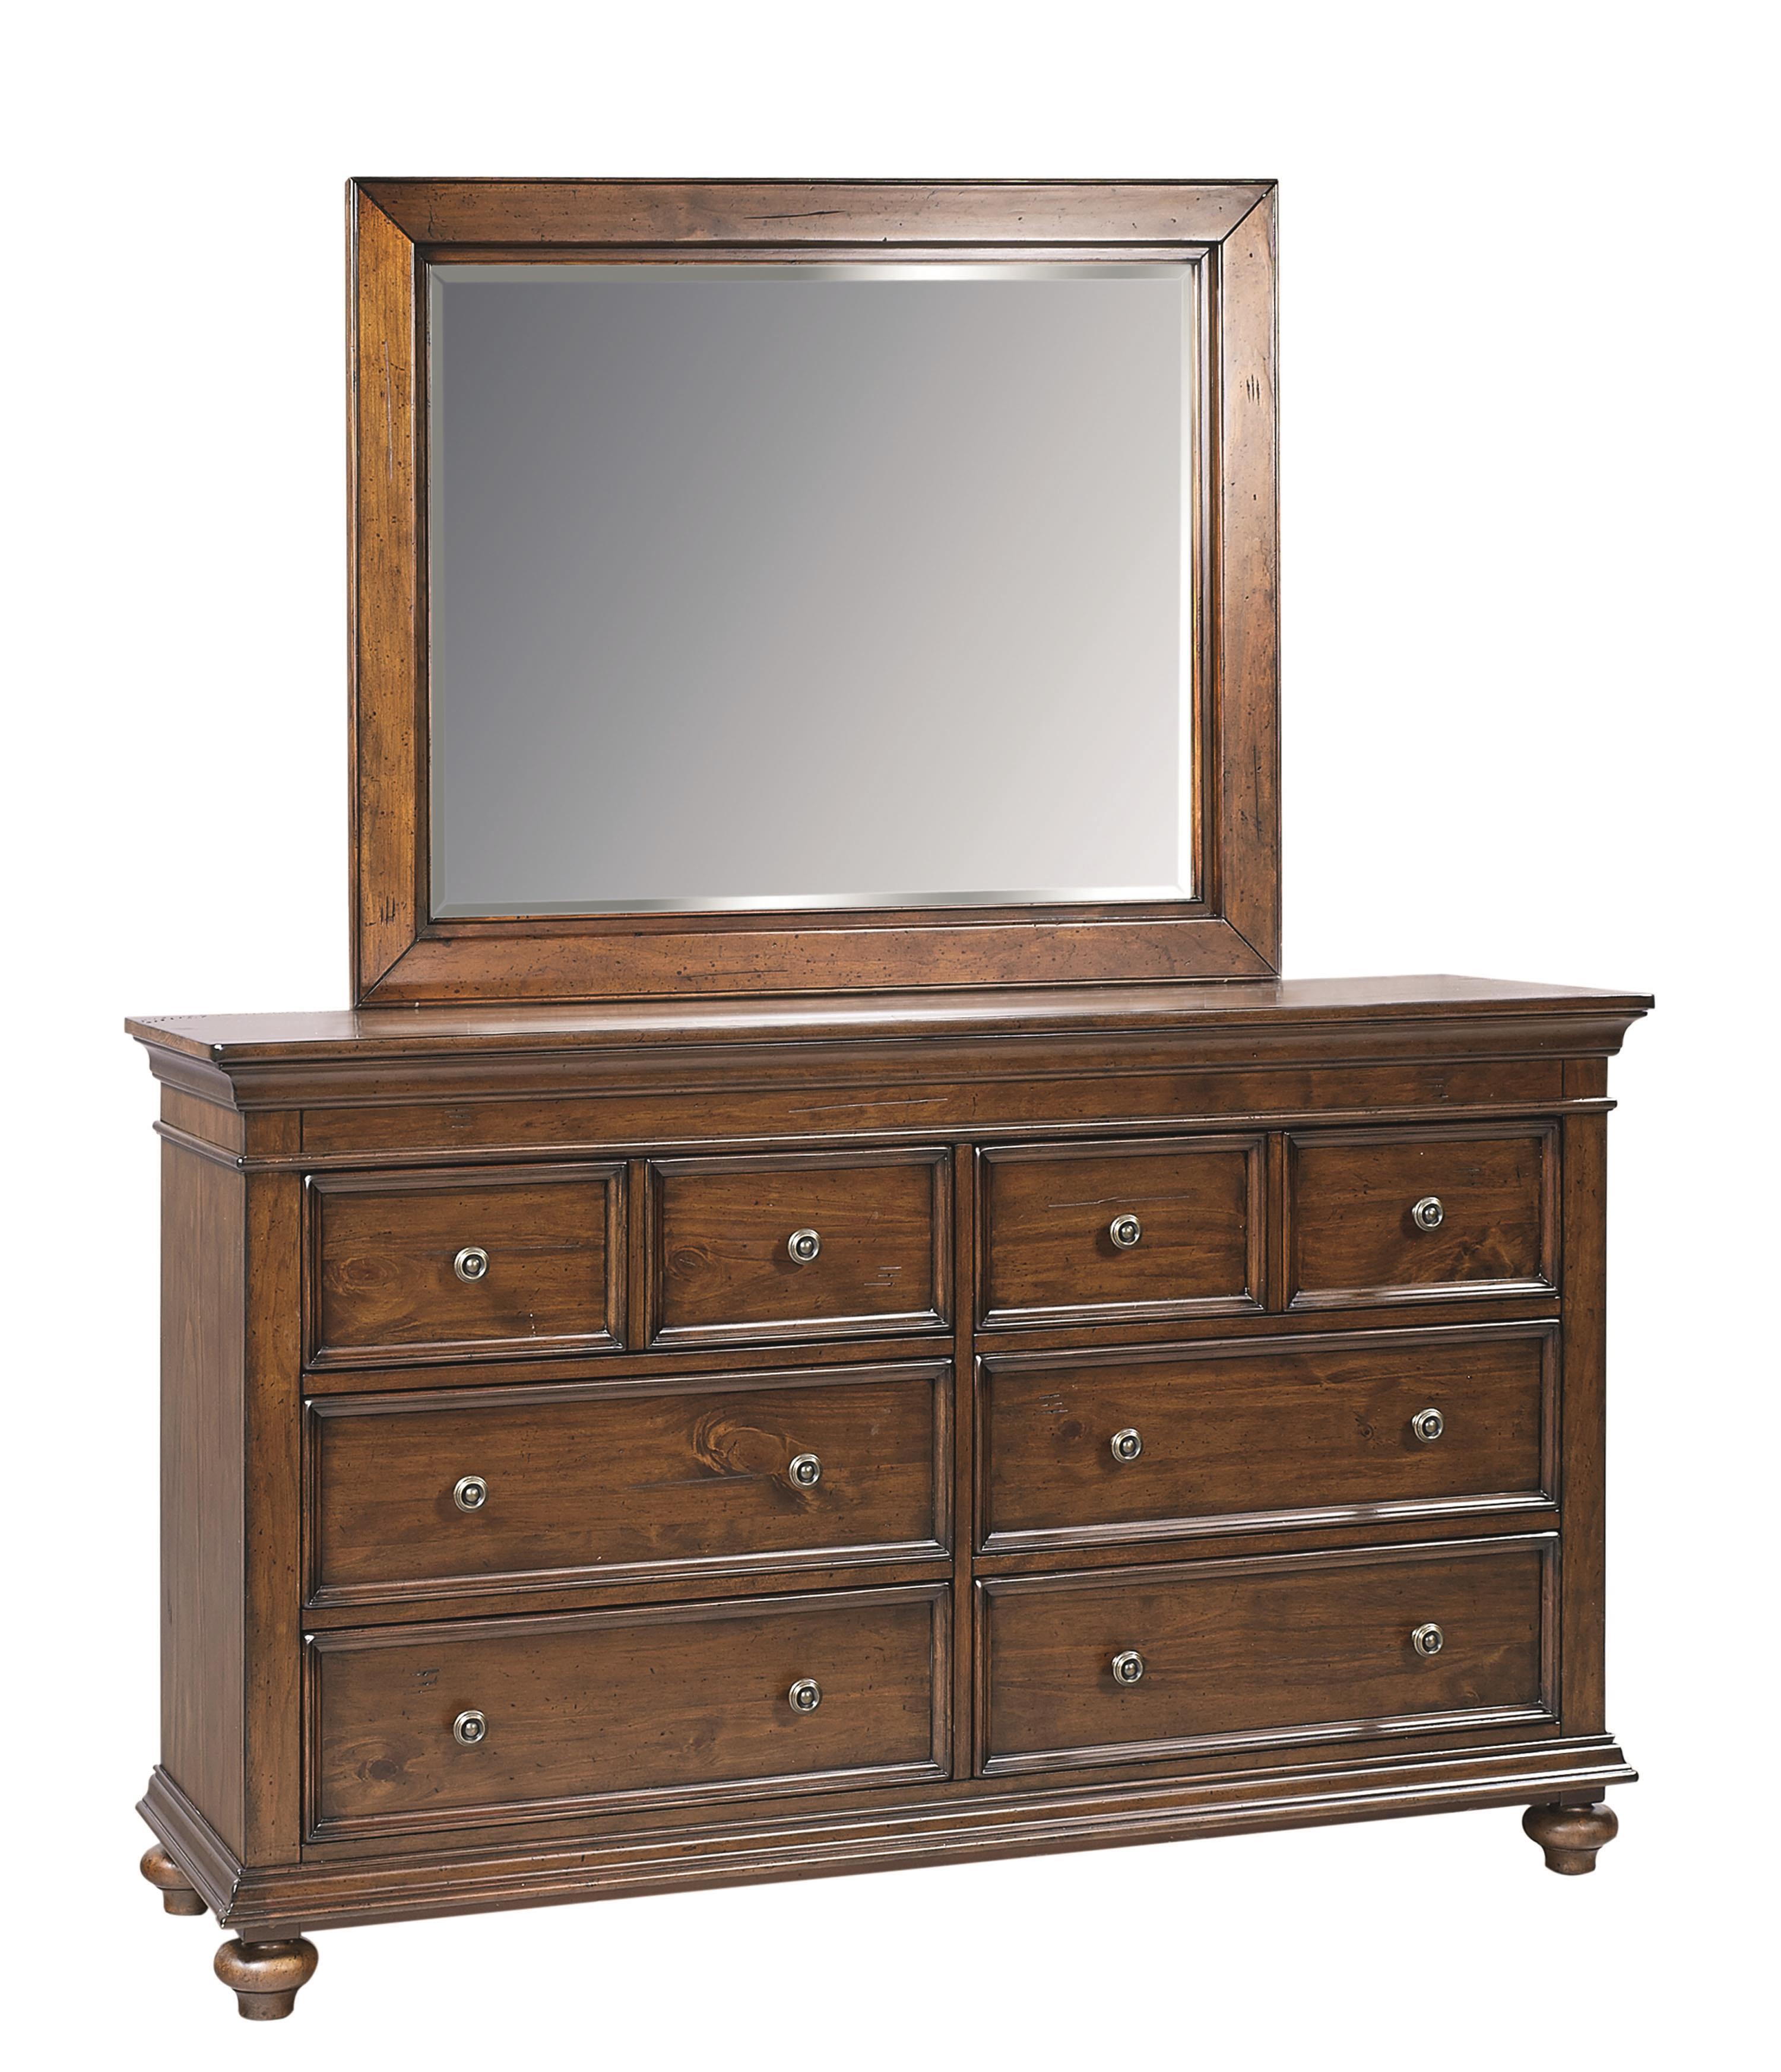 Aspenhome Camden Dresser and Mirror - Item Number: I57-453+464